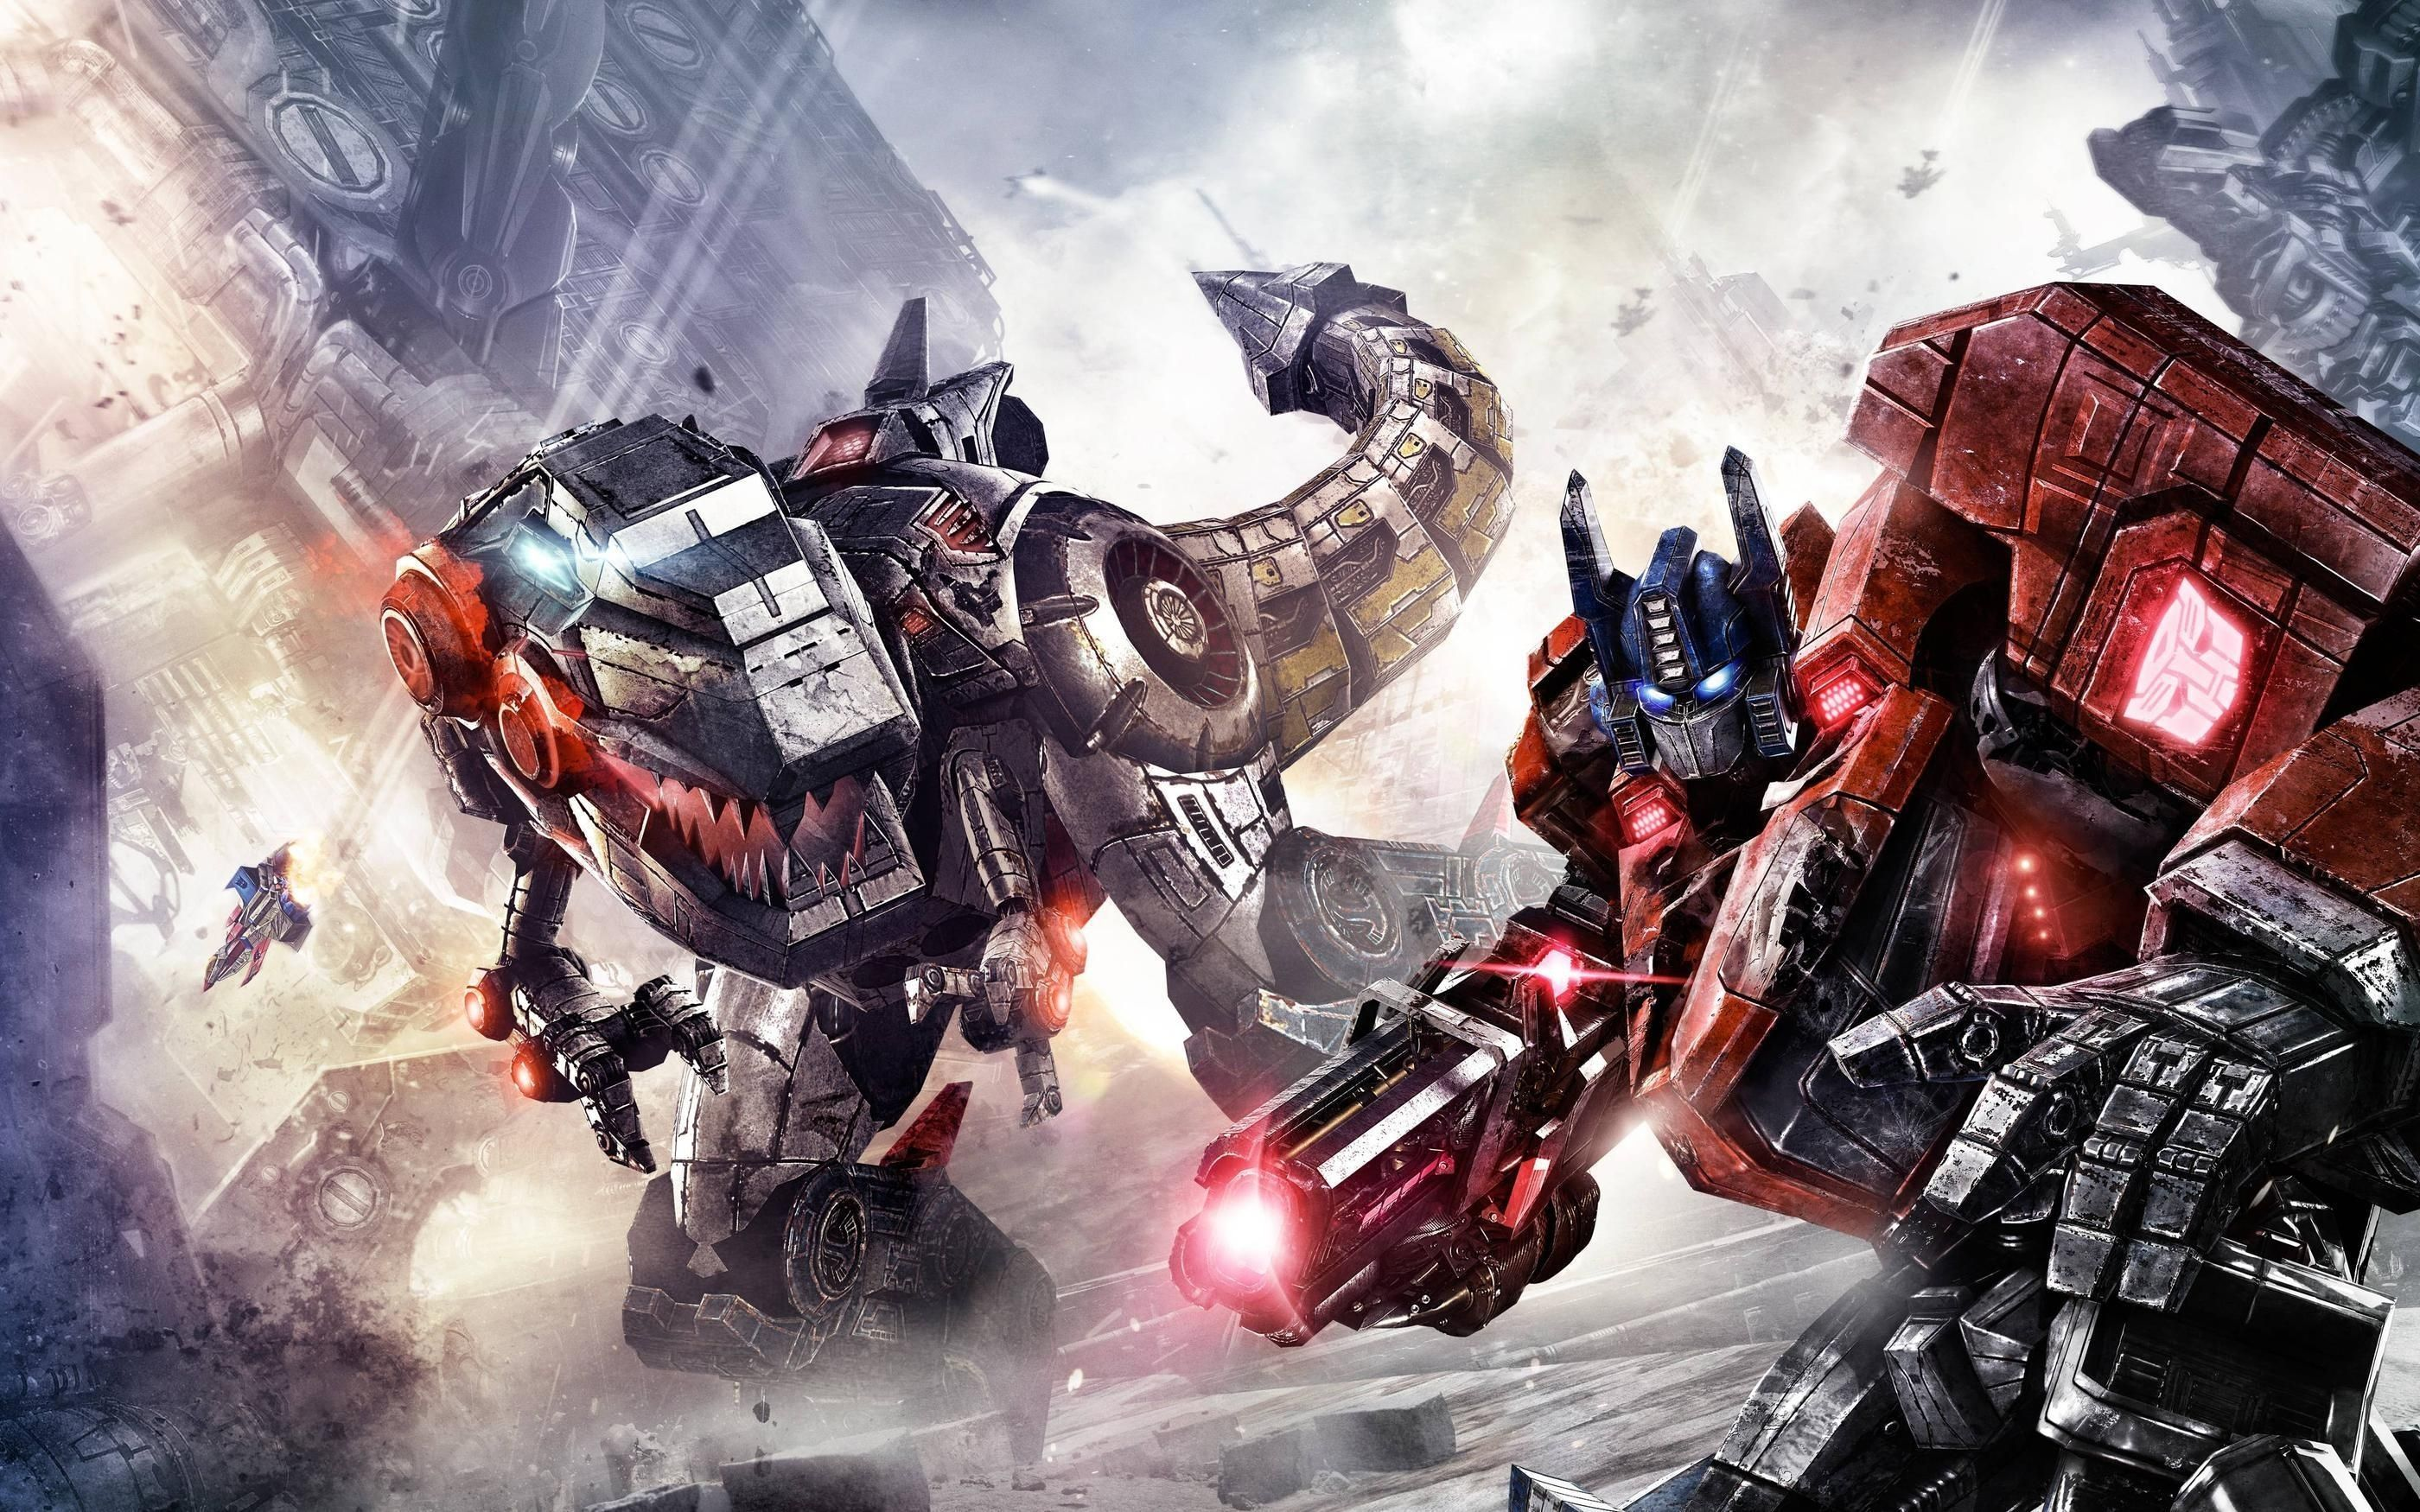 4K Ultra HD Transformers Wallpapers - Top Free 4K Ultra HD